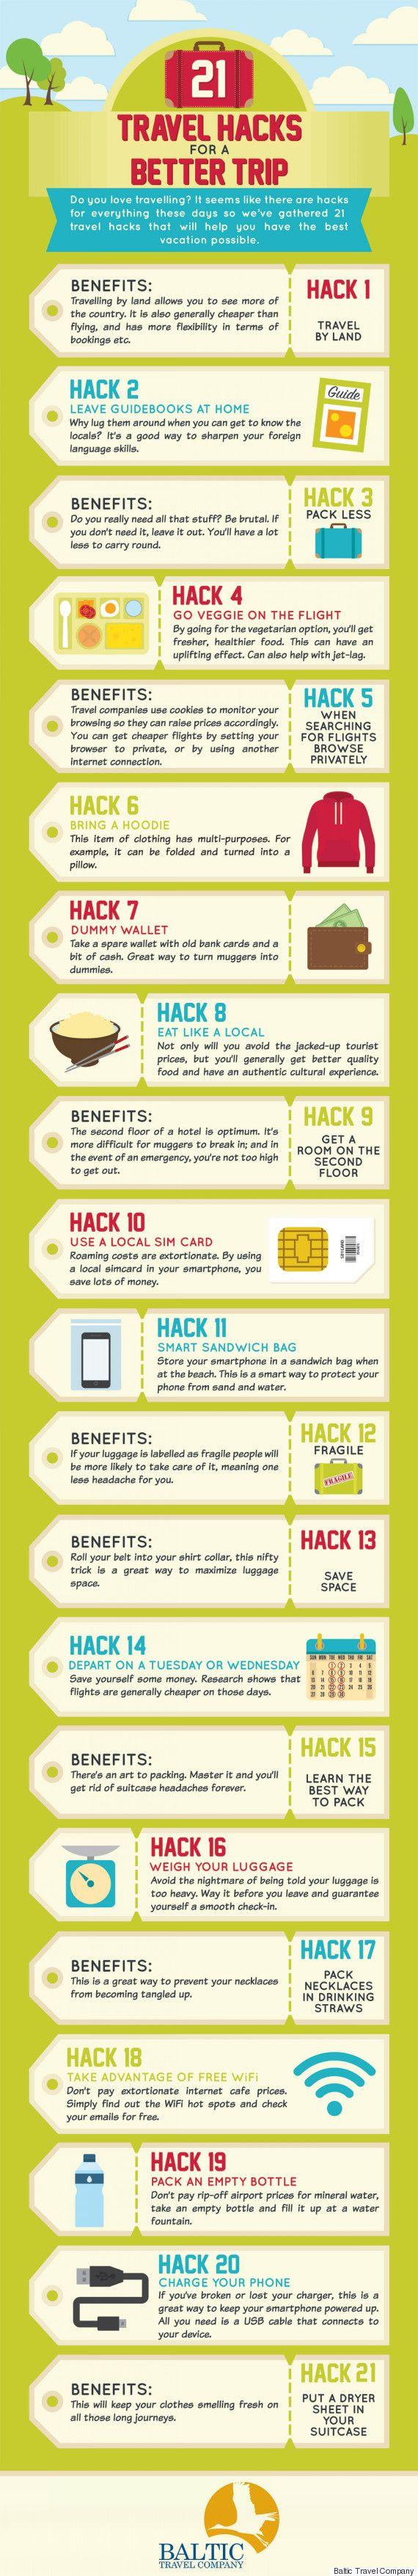 21 Travel Hacks for a Better Trip #TravelTips